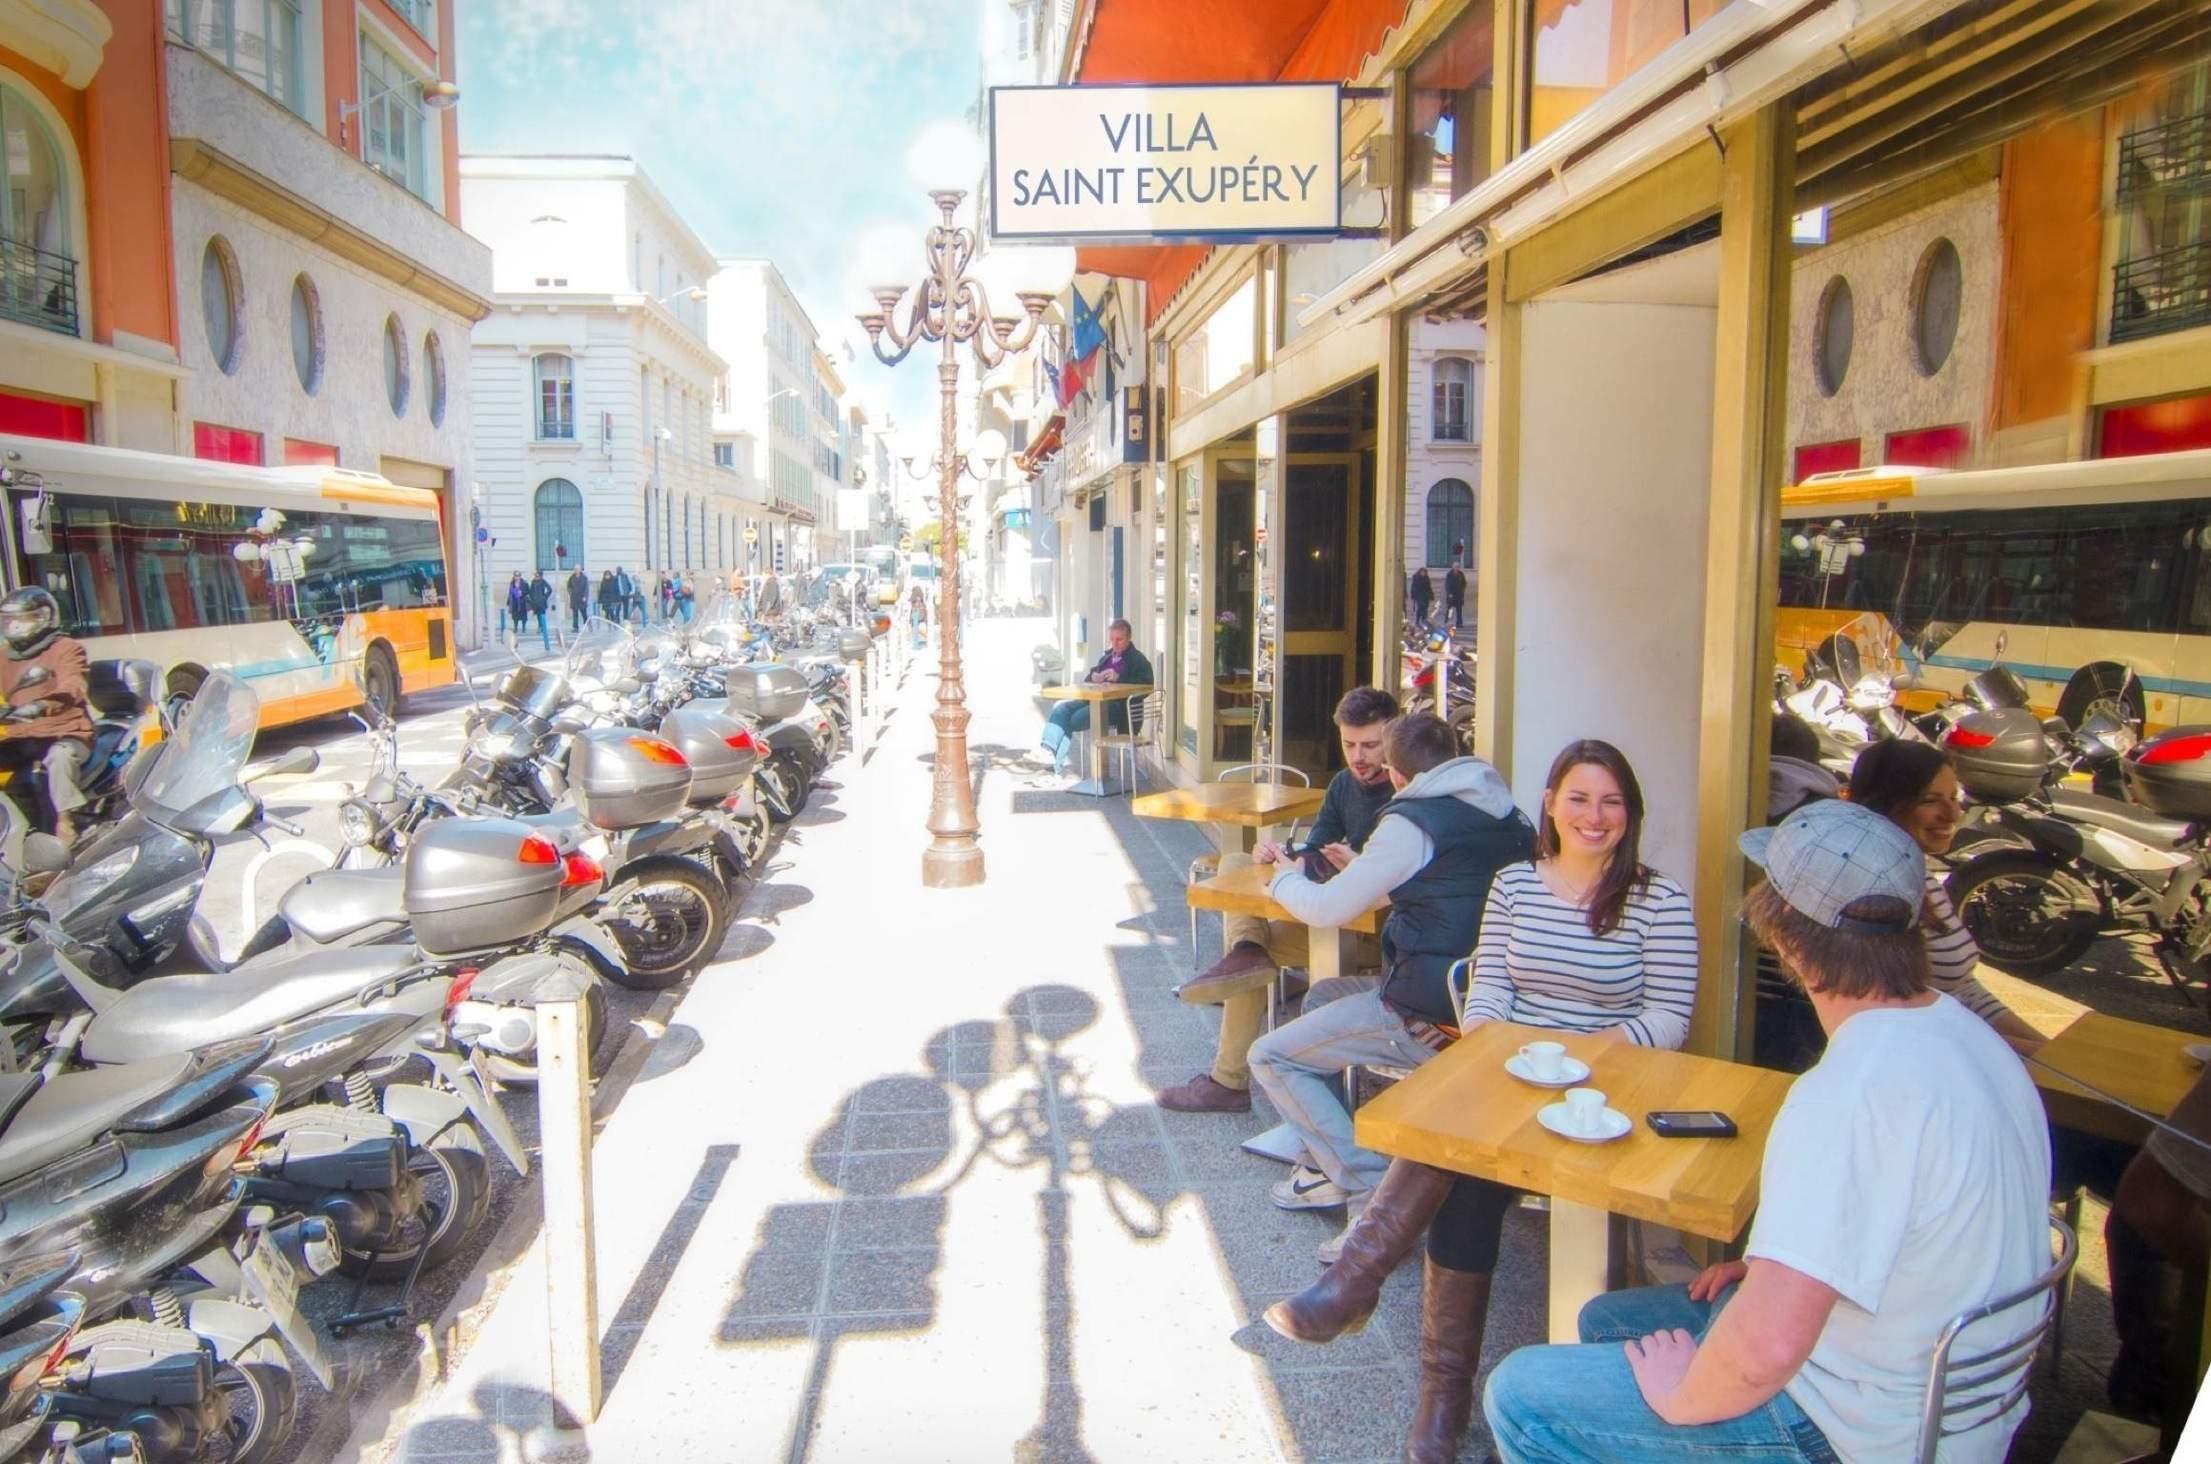 Cafe Terrace - Villa Saint Exupery